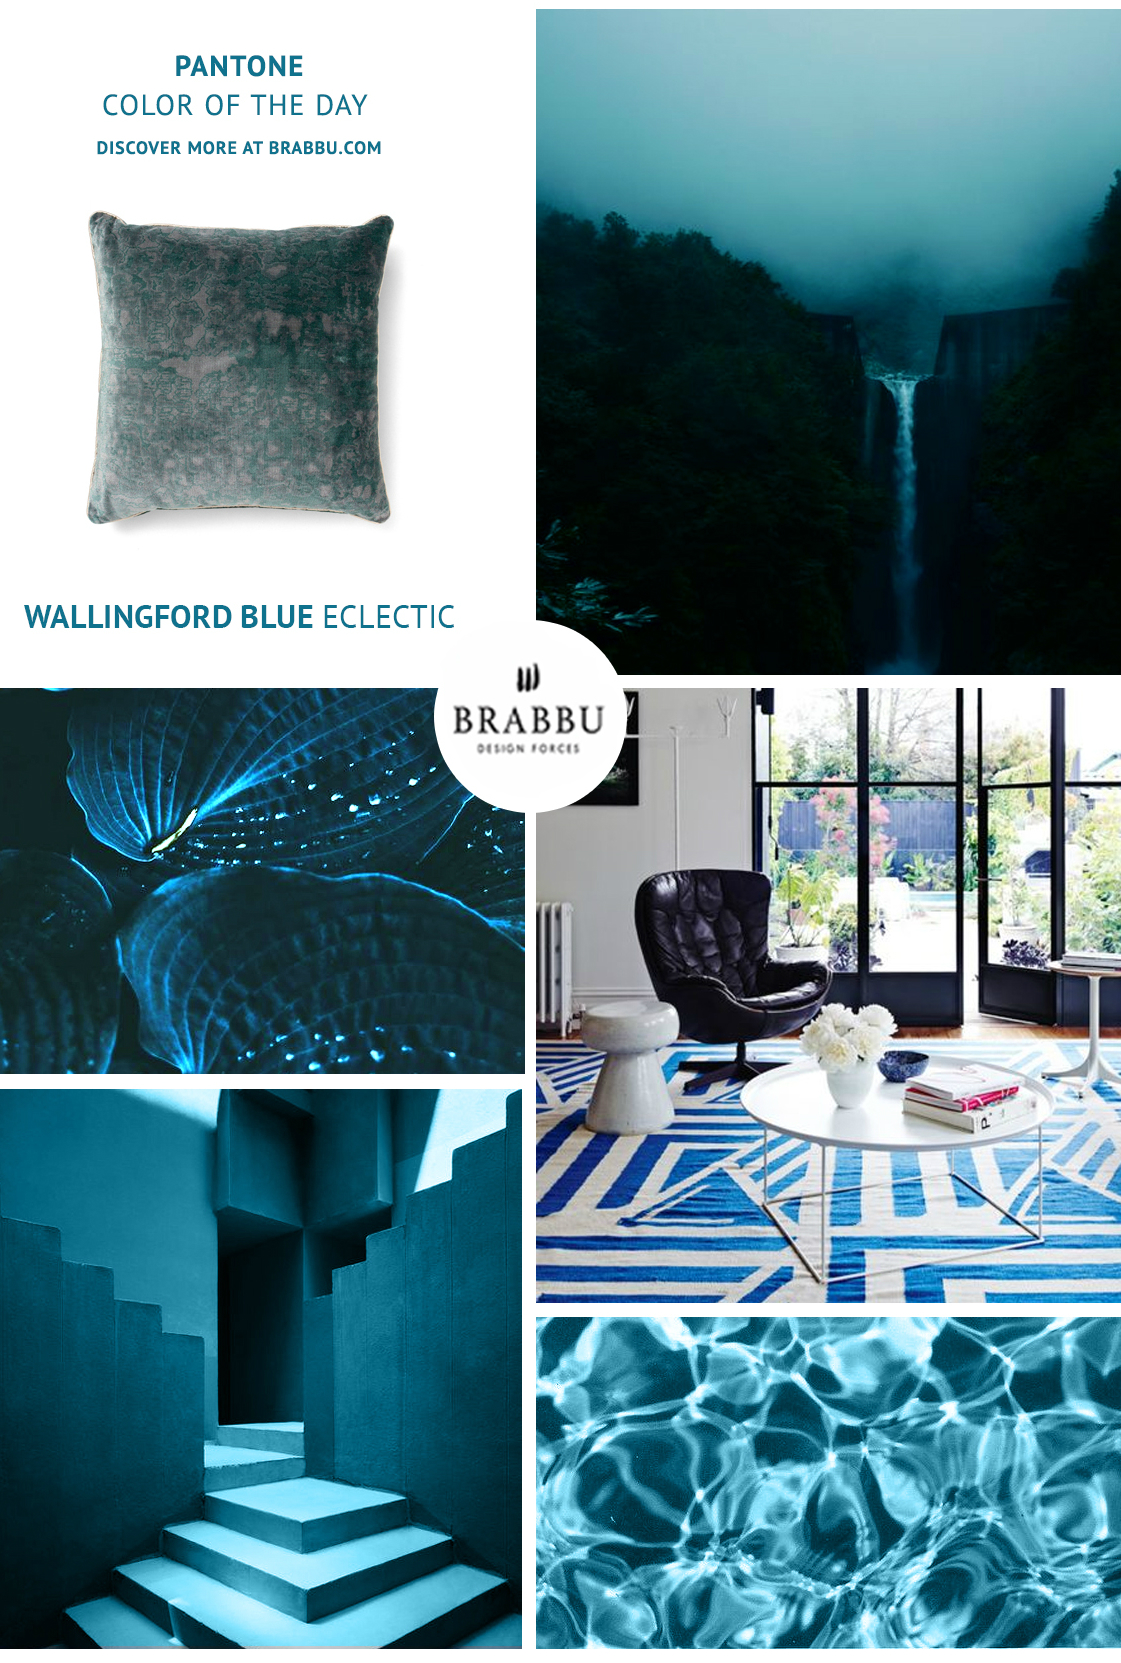 Top interior design trends for 2018 for Interior design inspiration 2018